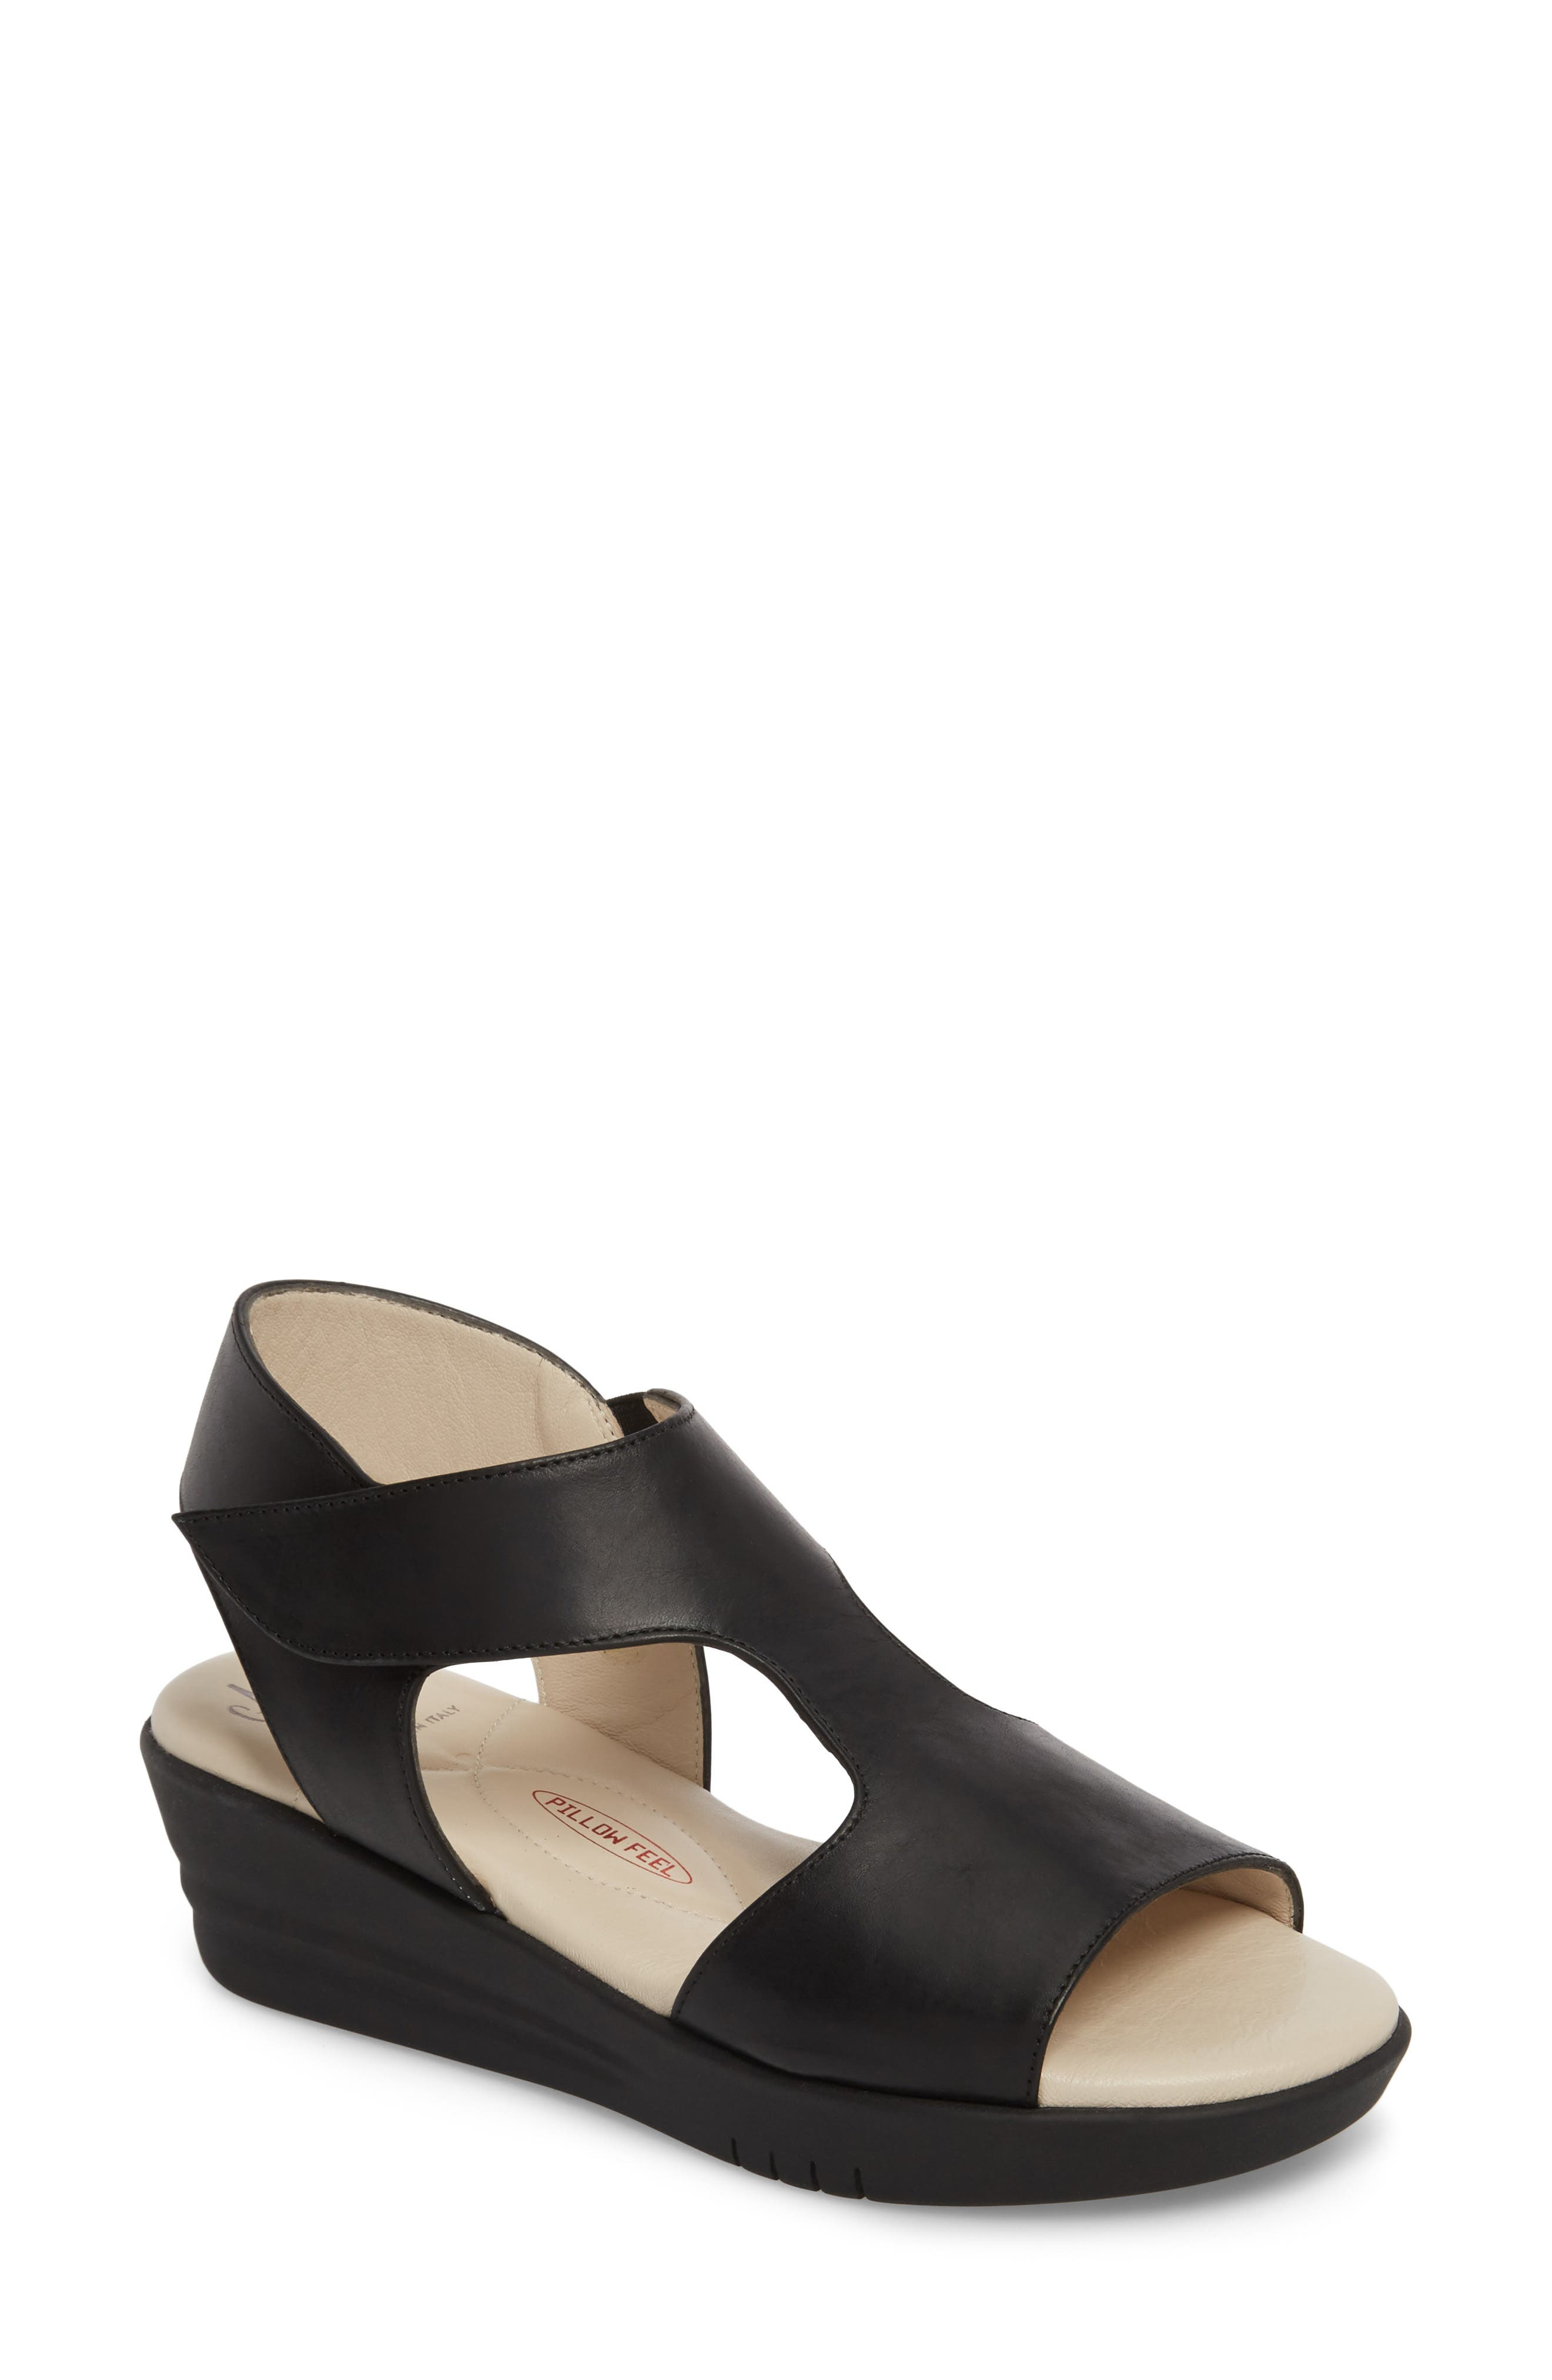 Gabby Platform Sandal,                         Main,                         color, BLACK LEATHER